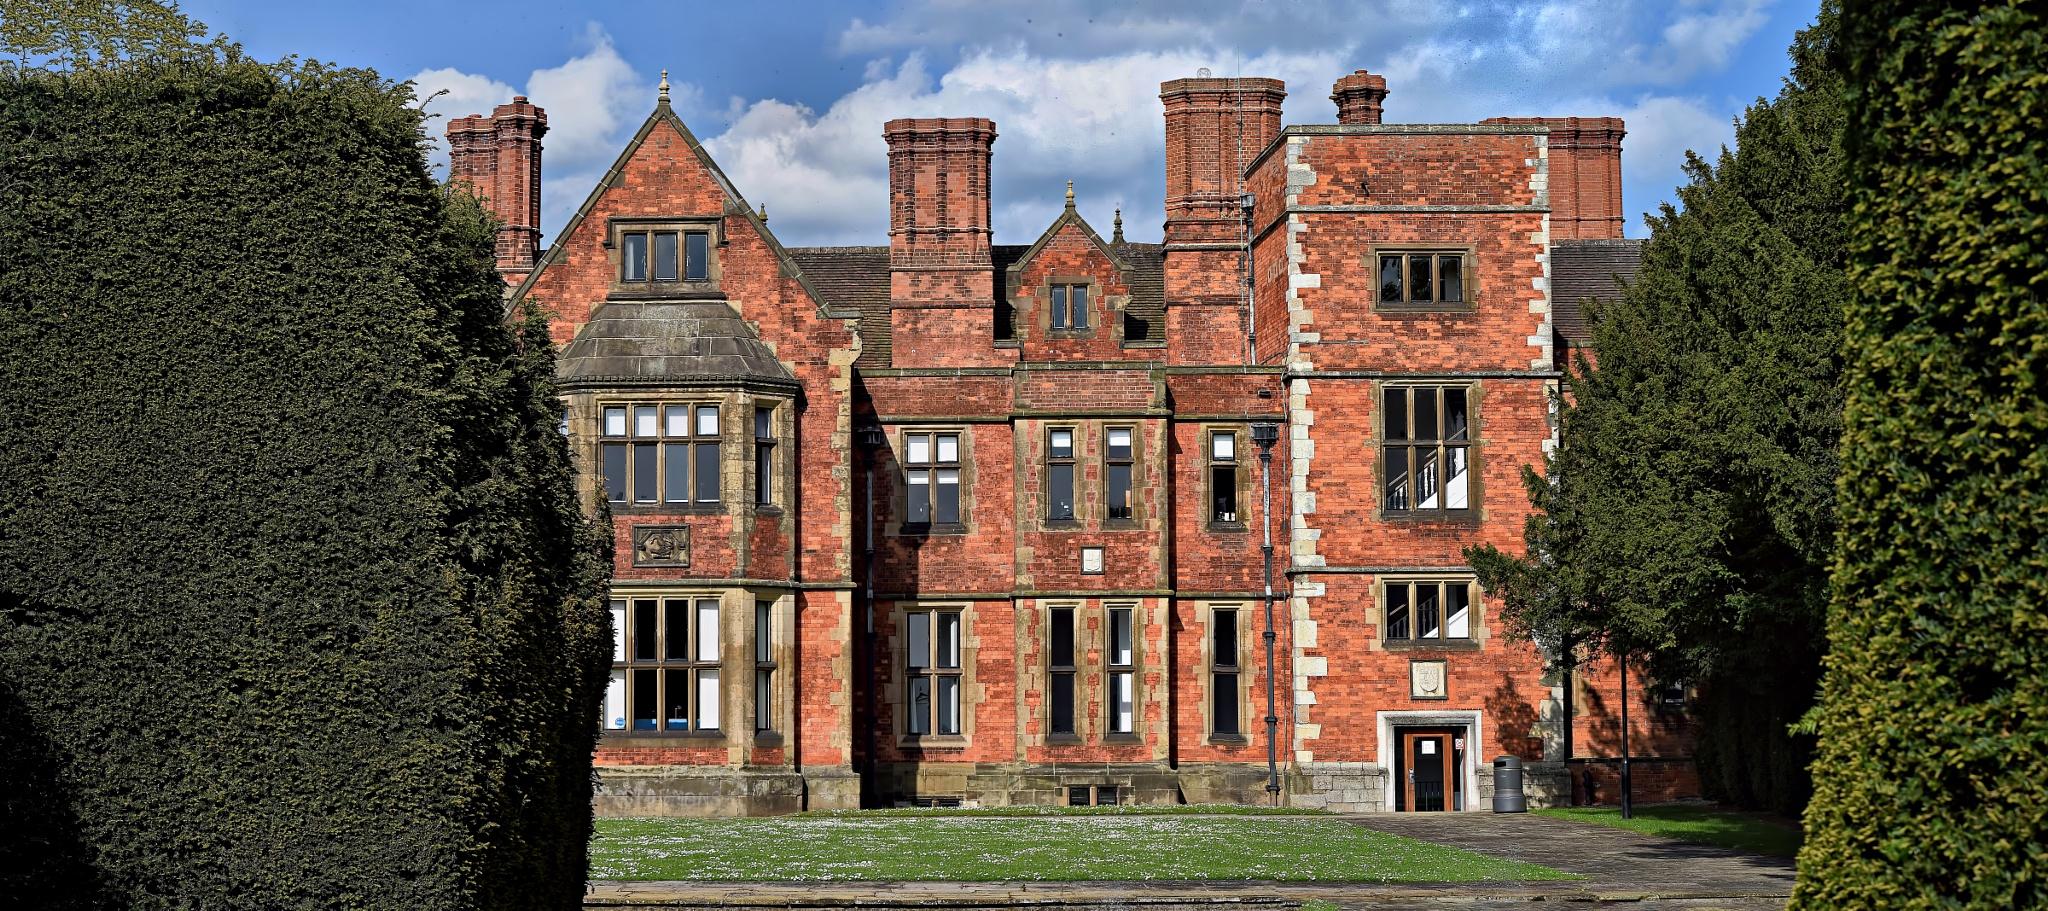 Heslington Hall - York by RichardBrigham